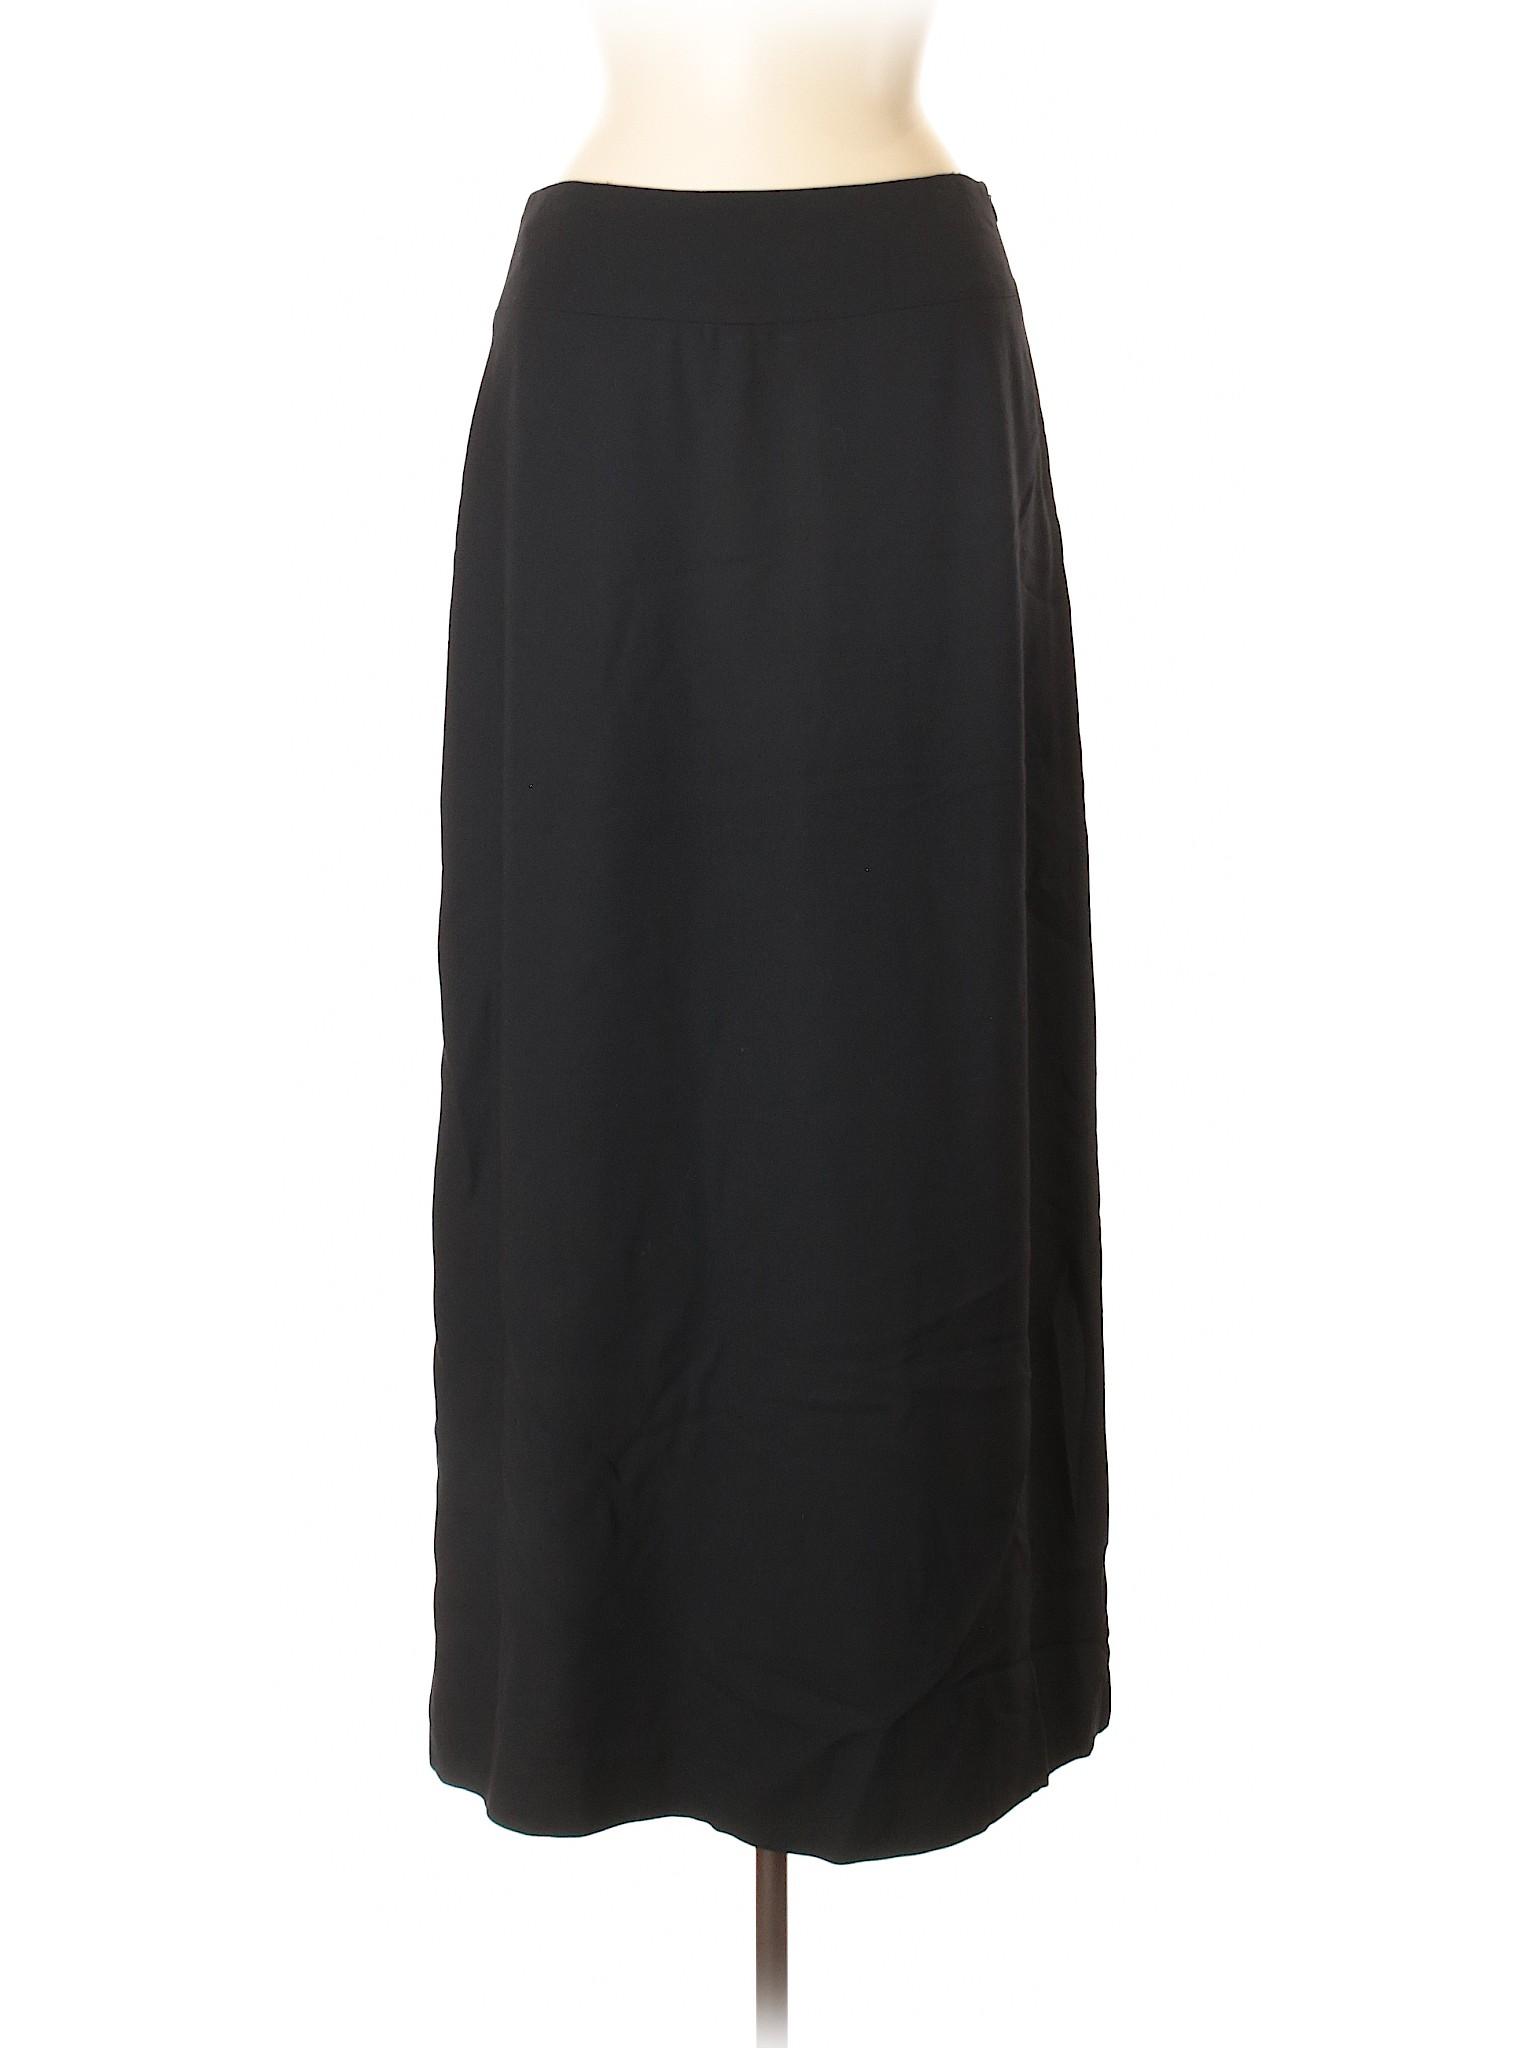 Leisure winter Factory Banana Store Wool Republic Skirt 7qU07xTrw